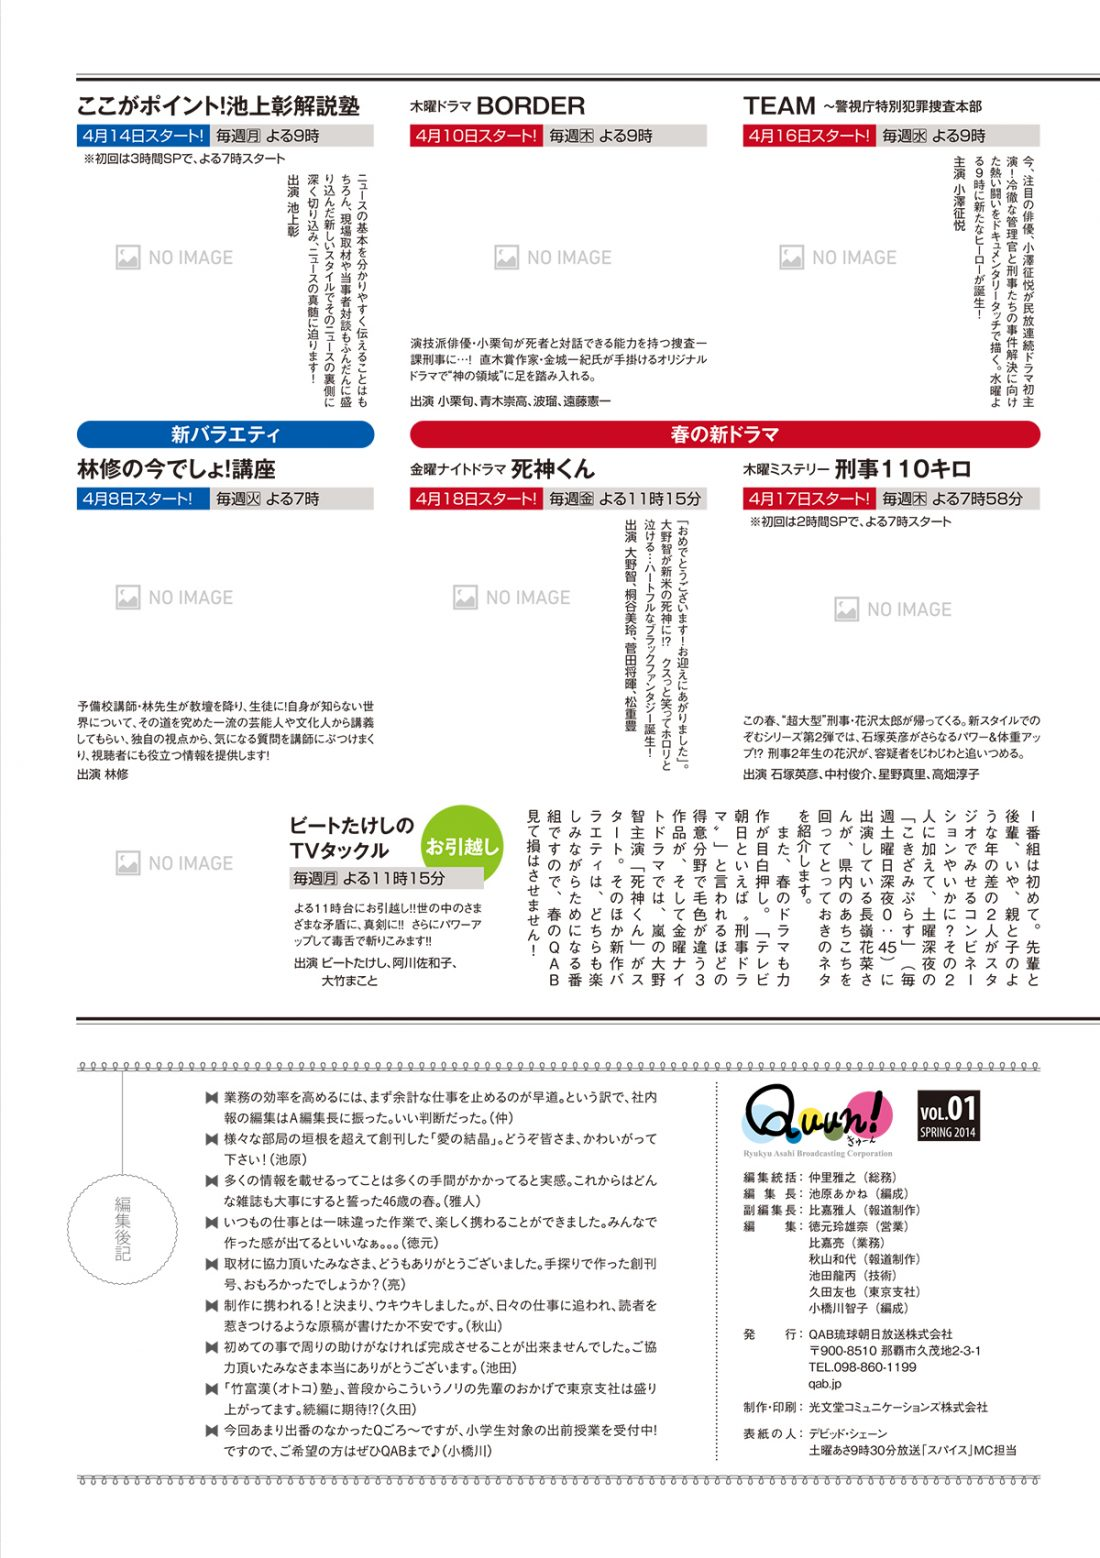 https://www.qab.co.jp/qgoro/wp-content/uploads/quun_0115-1100x1558.jpg